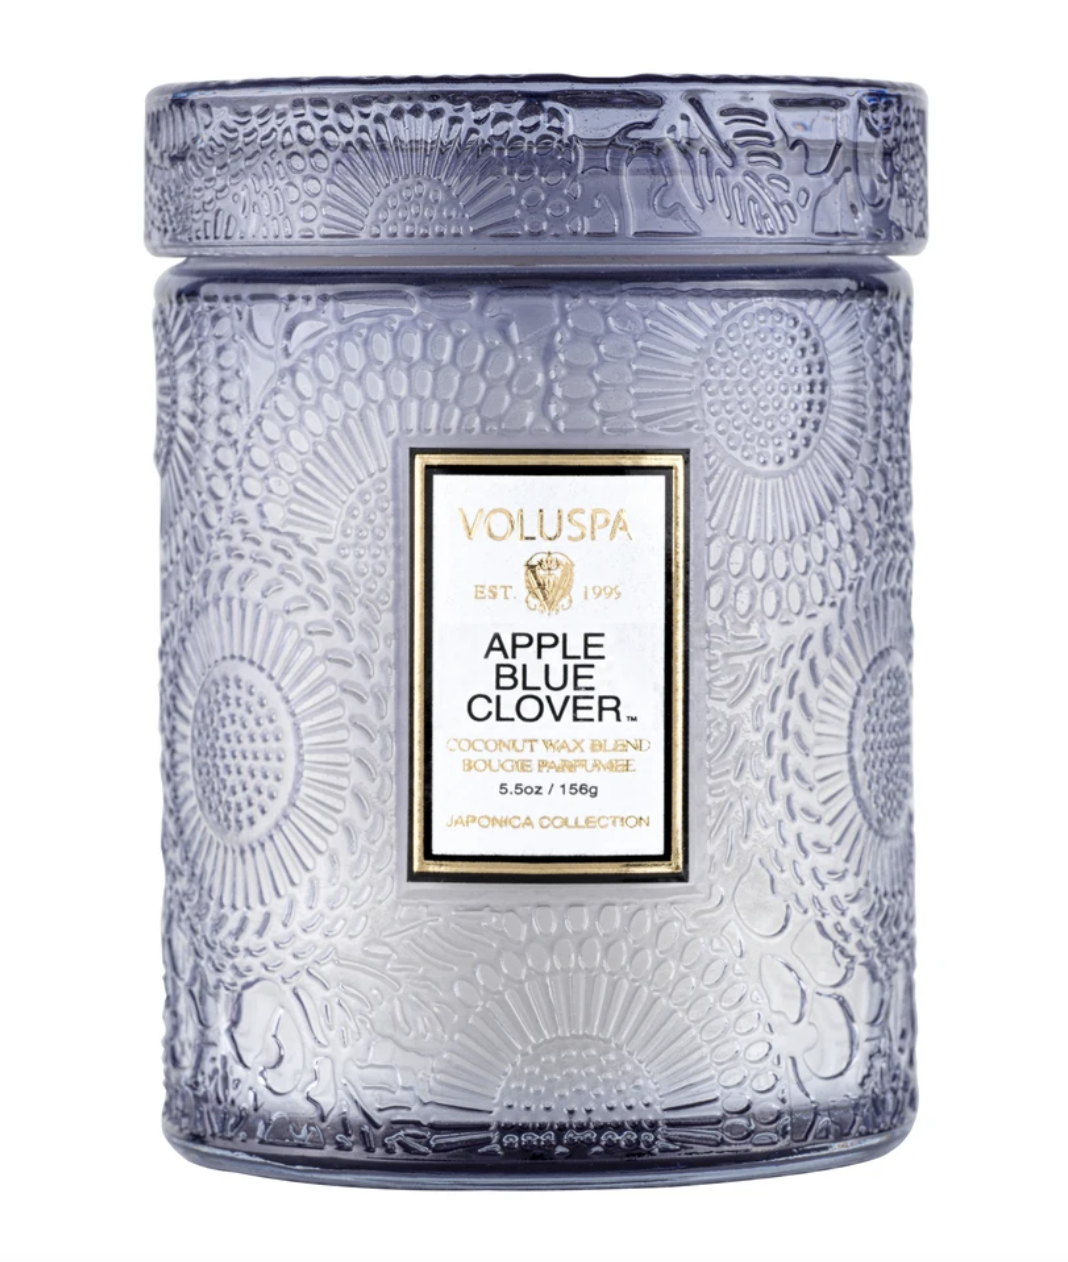 Voluspa Apple Blue Clover, Embossed Glass Jar with Lid